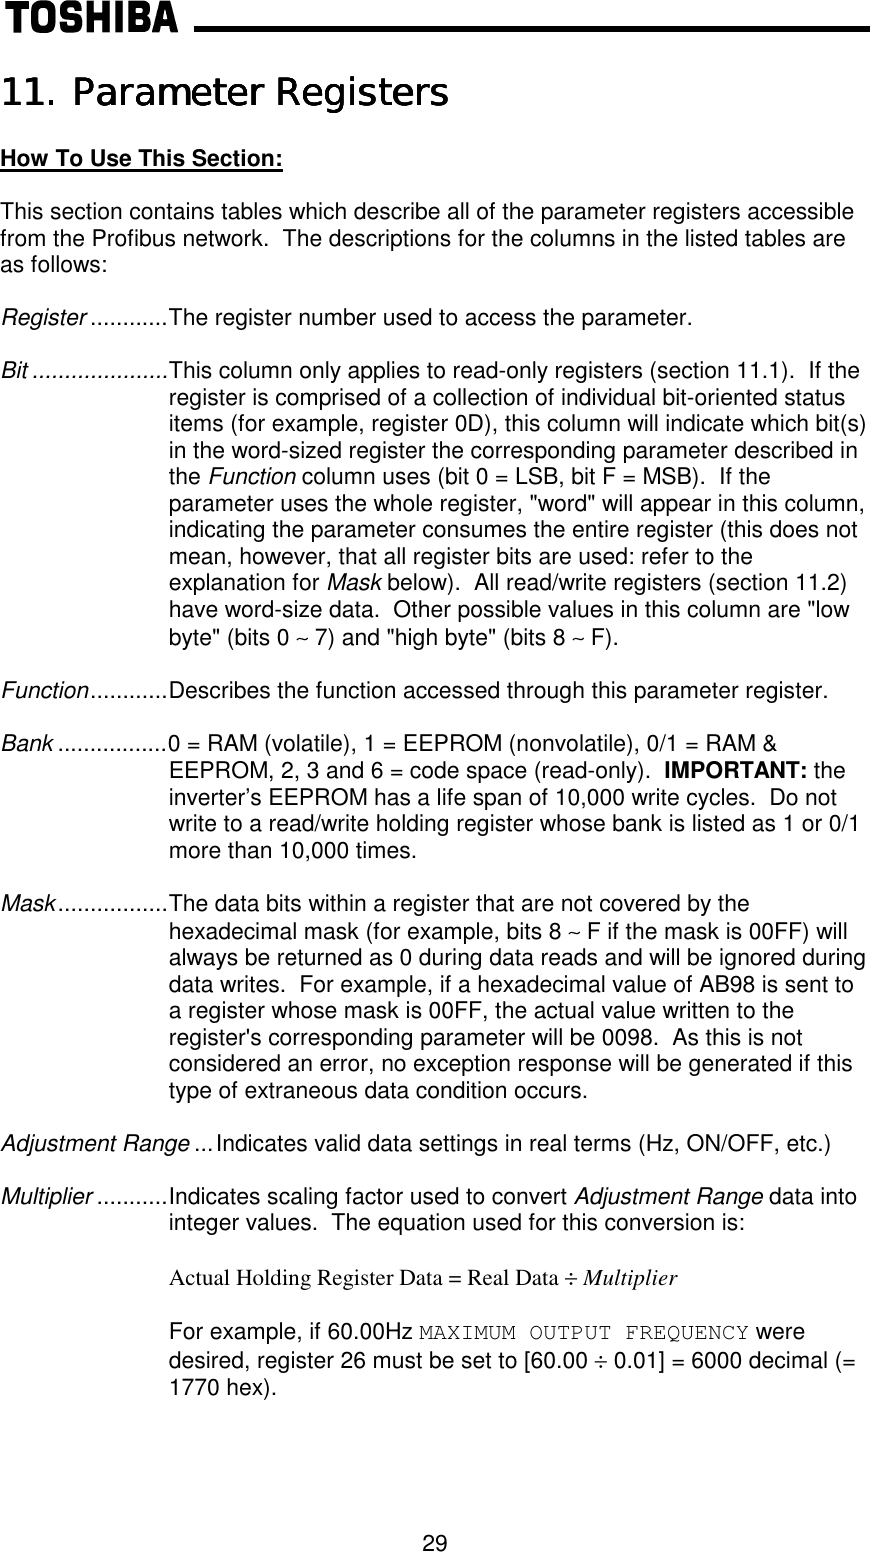 Toshiba G3 Tosvert 130 Instruction Manual 3 series ASD Profibus